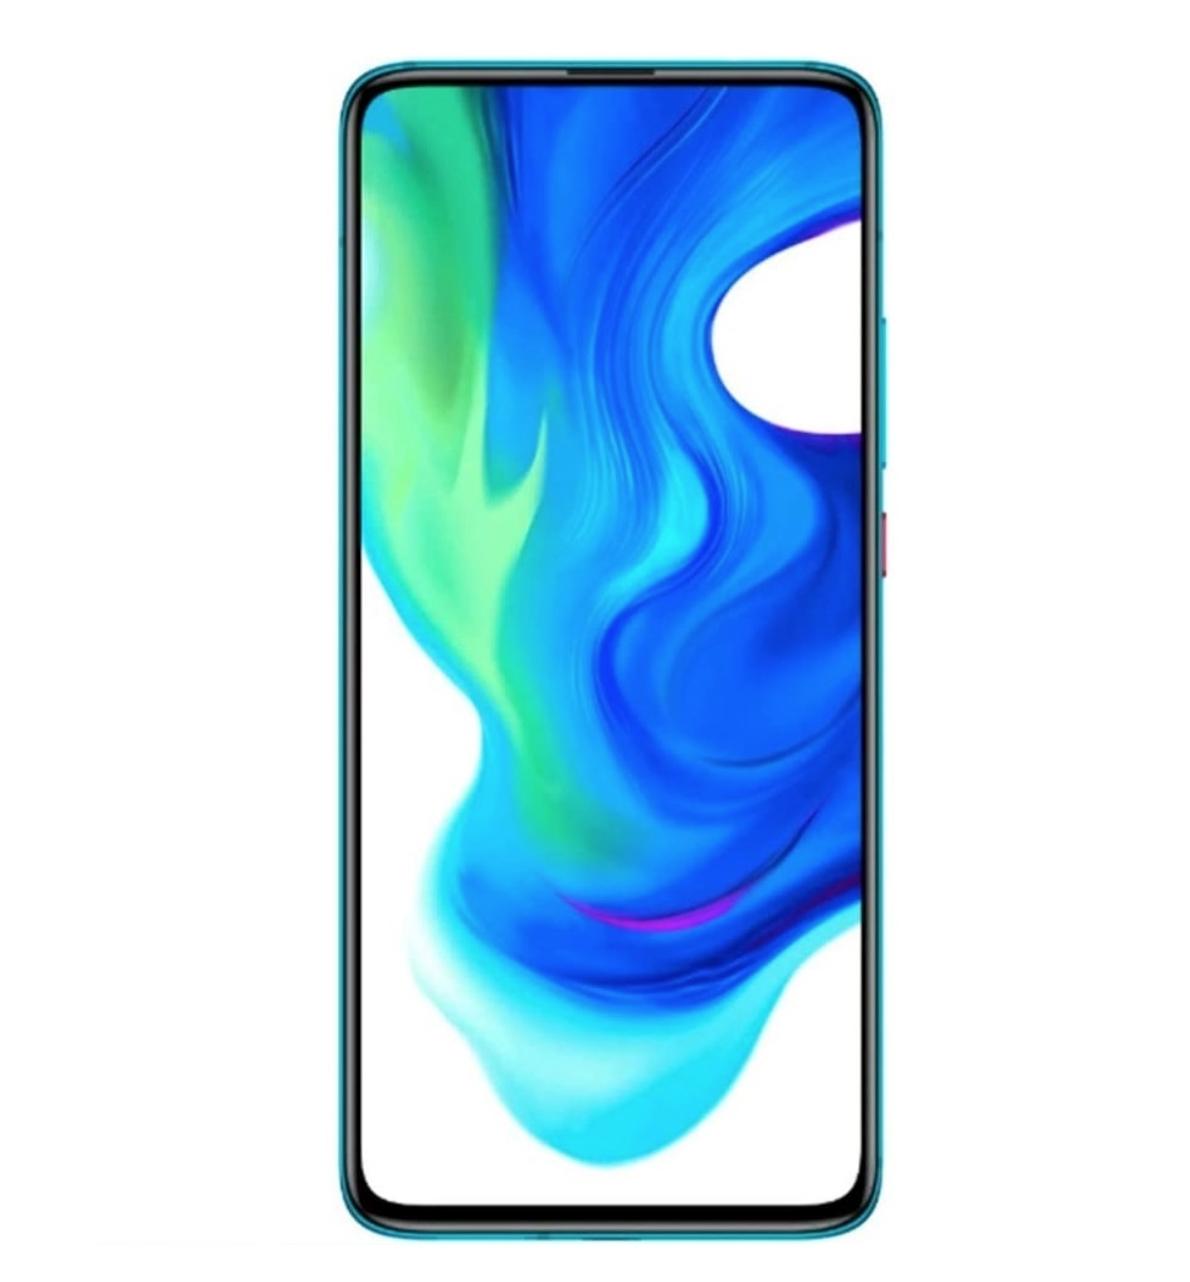 Xiaomi Pocophone F2 Pro 5G SD865 128GB 6GB RAM Dual SIM (Unlocked for all UK networks) - Neon Blue / Cyber Grey - £380 delivered @ Wowcamera